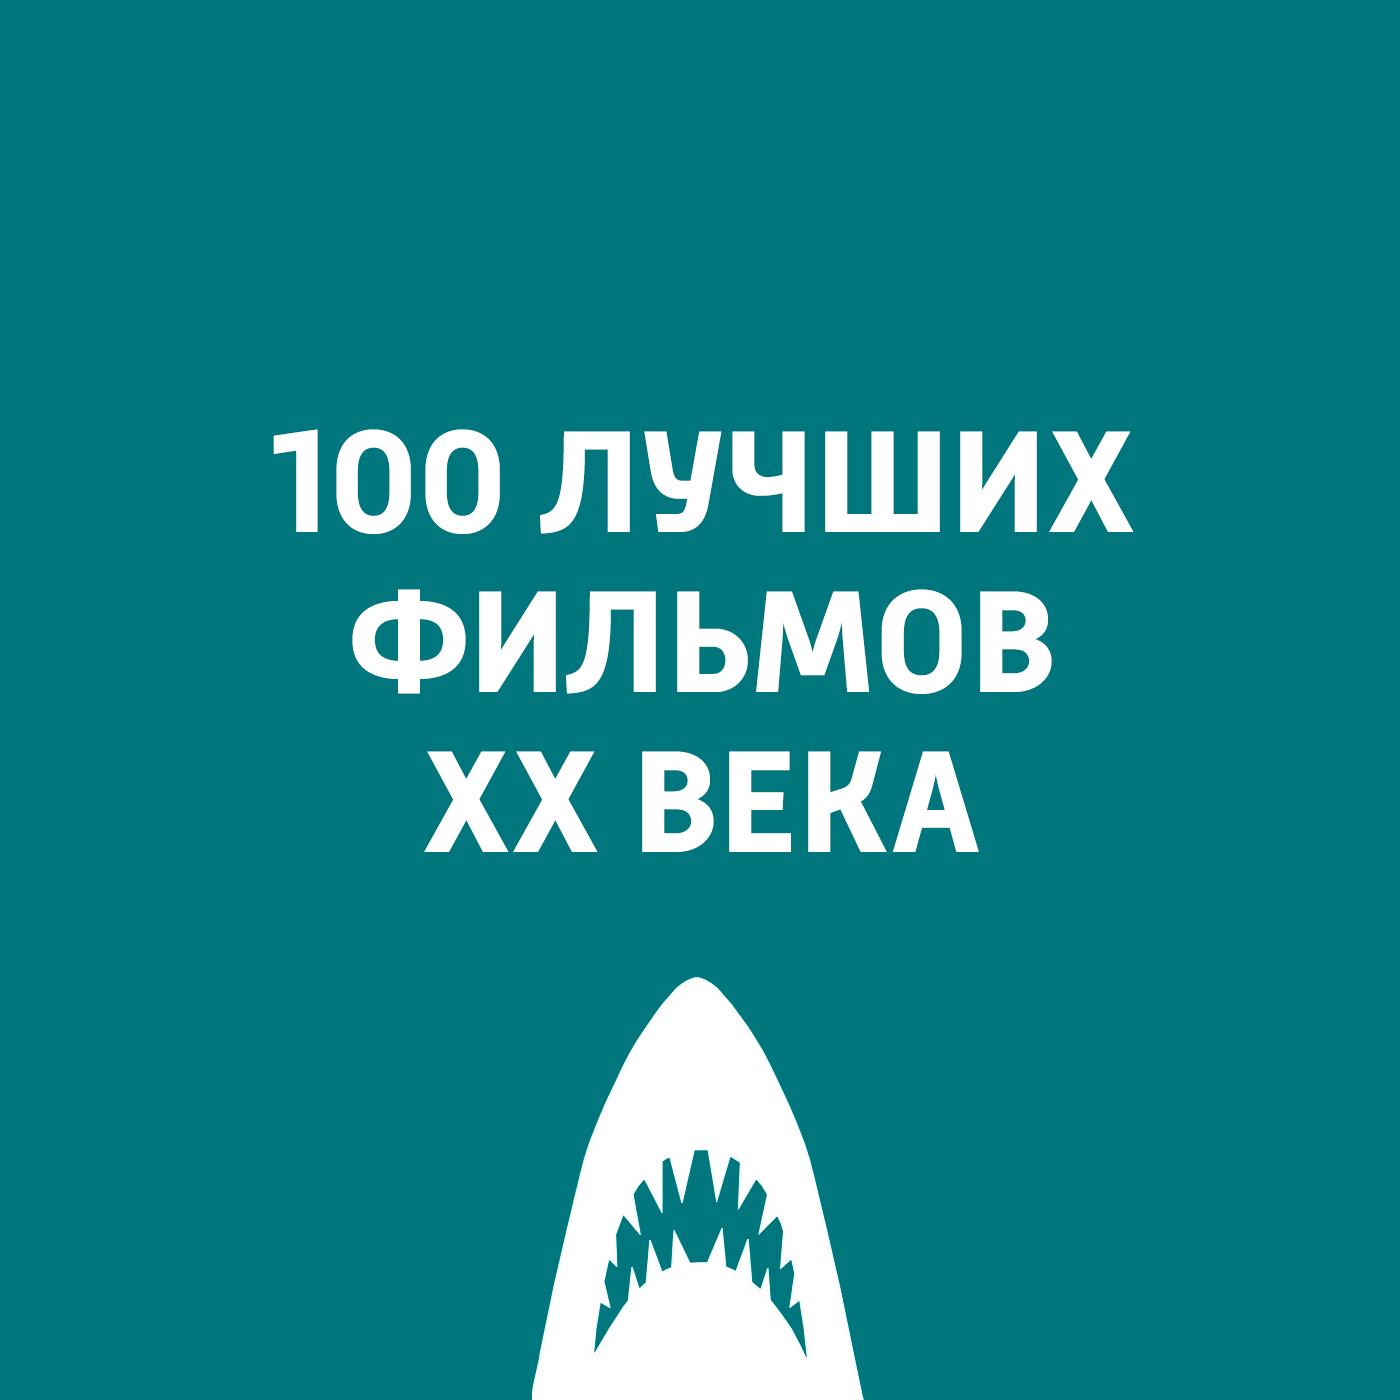 Антон Долин Криминальное чтиво аккумуляторный кусторез ryobi rht1851r20